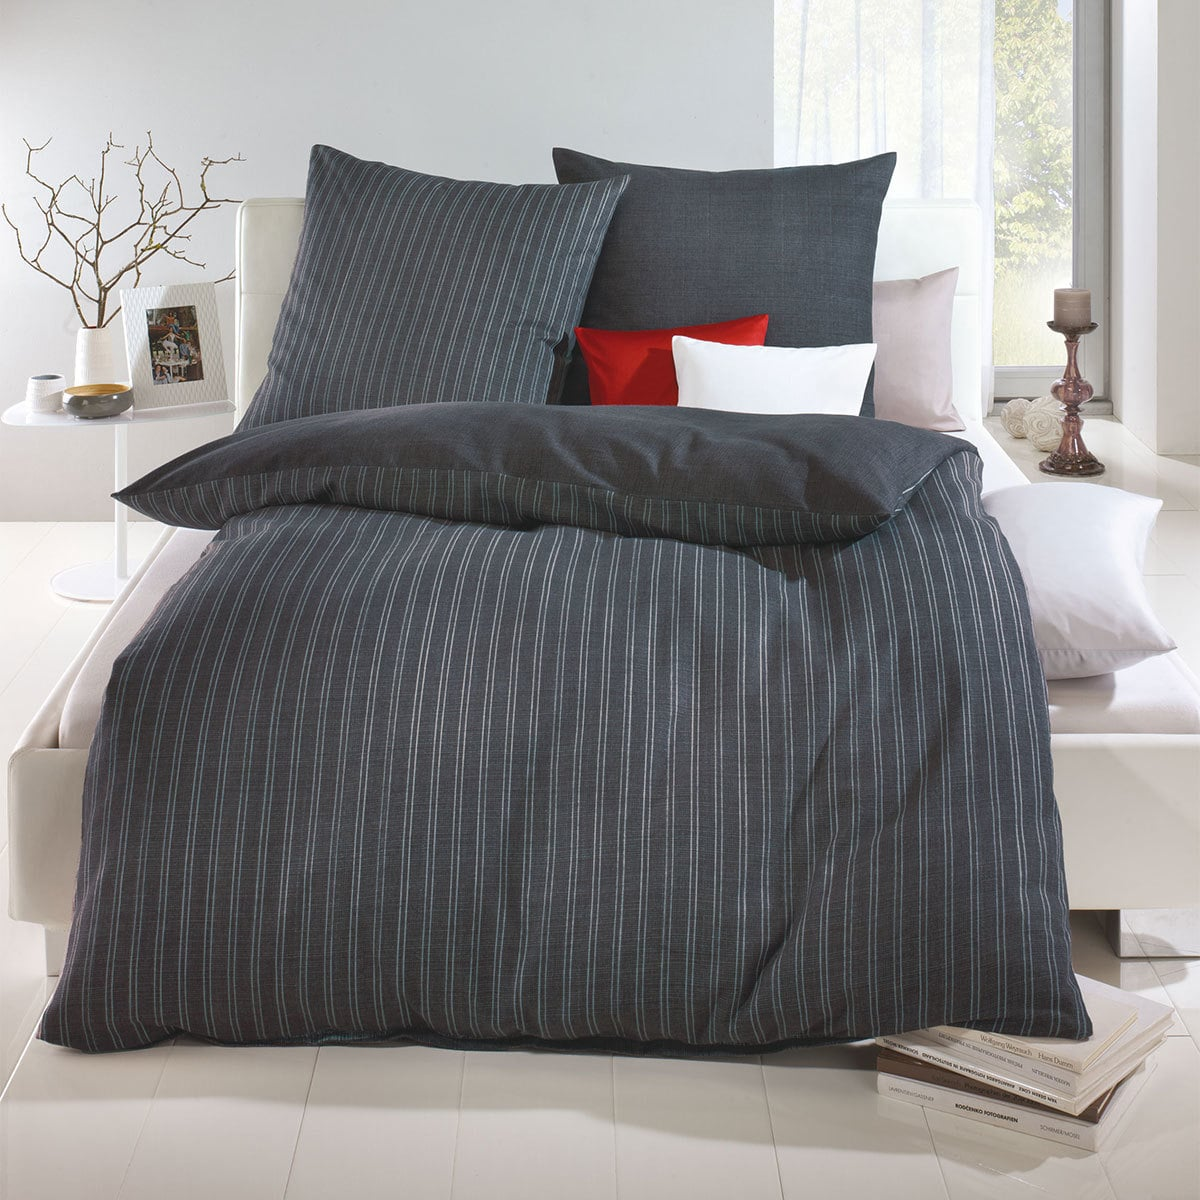 bettwarenshop biber bettw sche eternity combo zinn g nstig online kaufen bei bettwaren shop. Black Bedroom Furniture Sets. Home Design Ideas